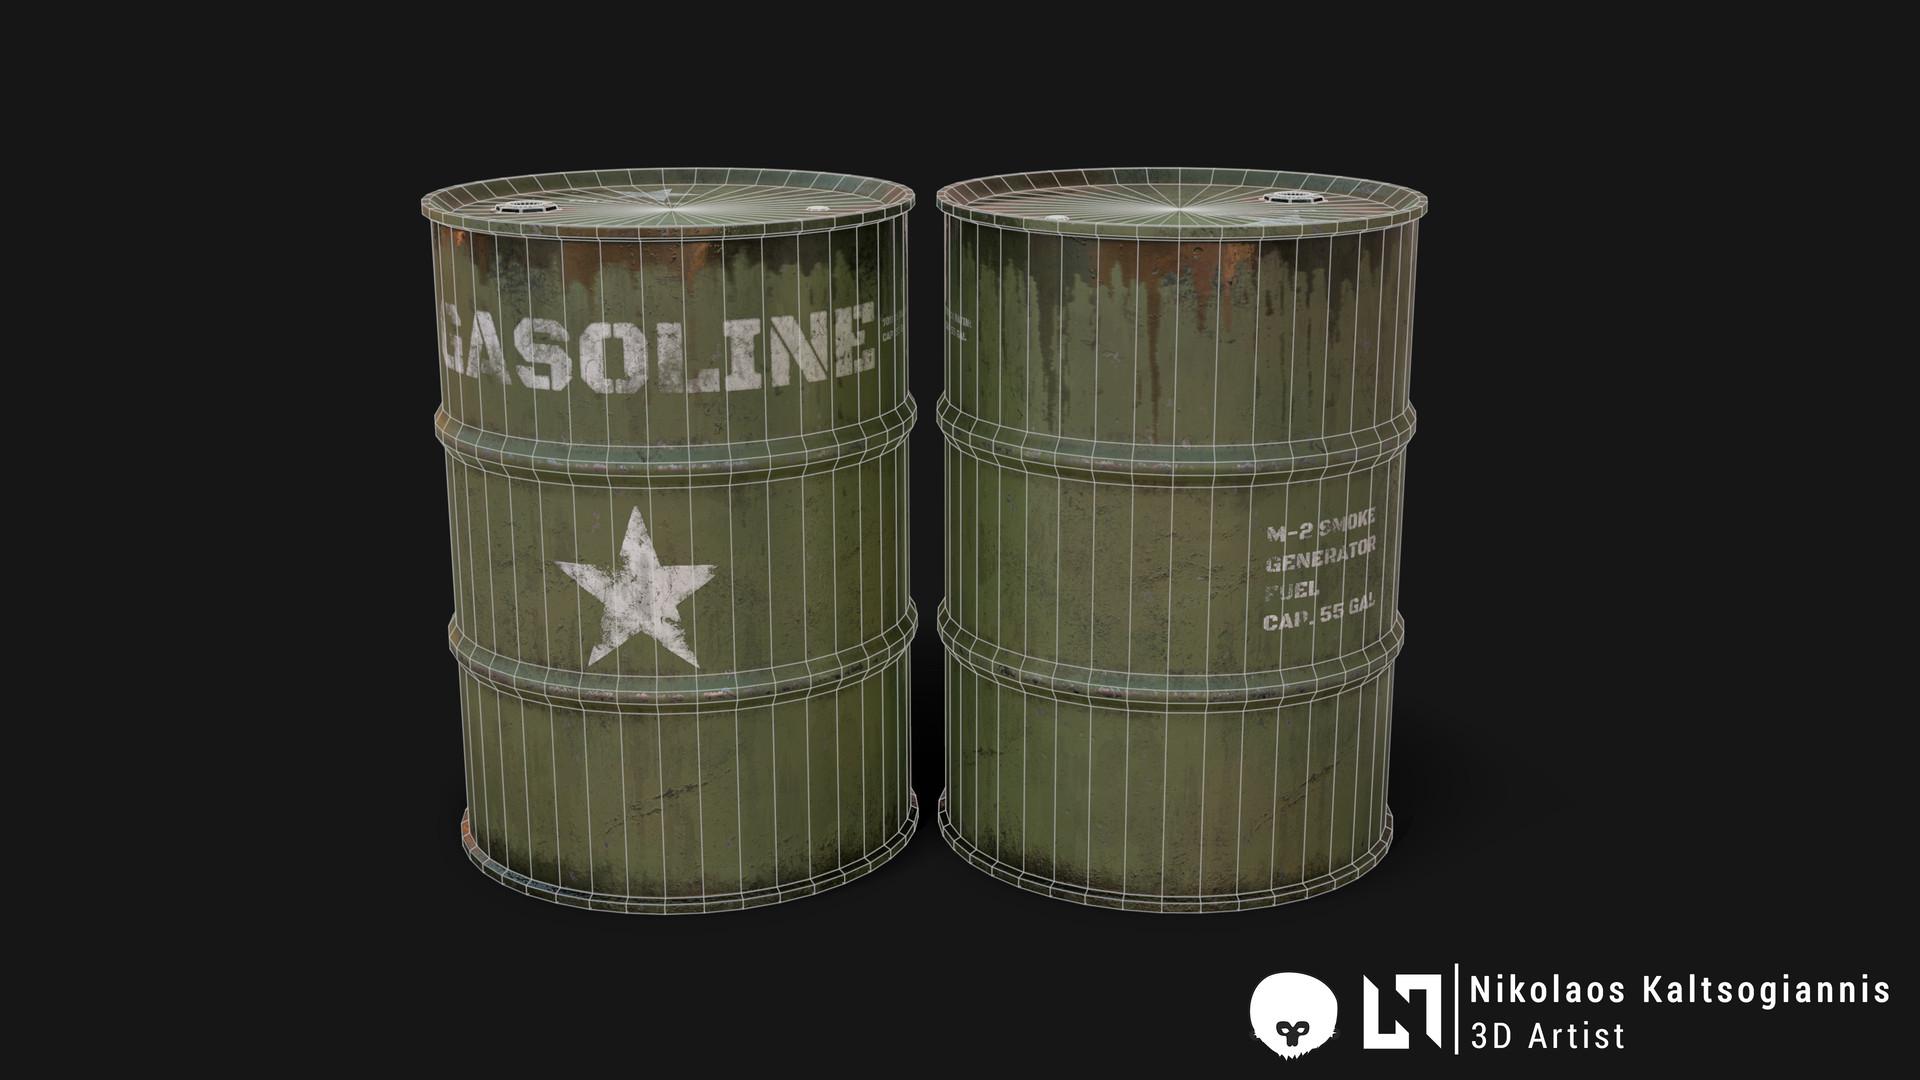 Nikolaos kaltsogiannis steel barrel 02